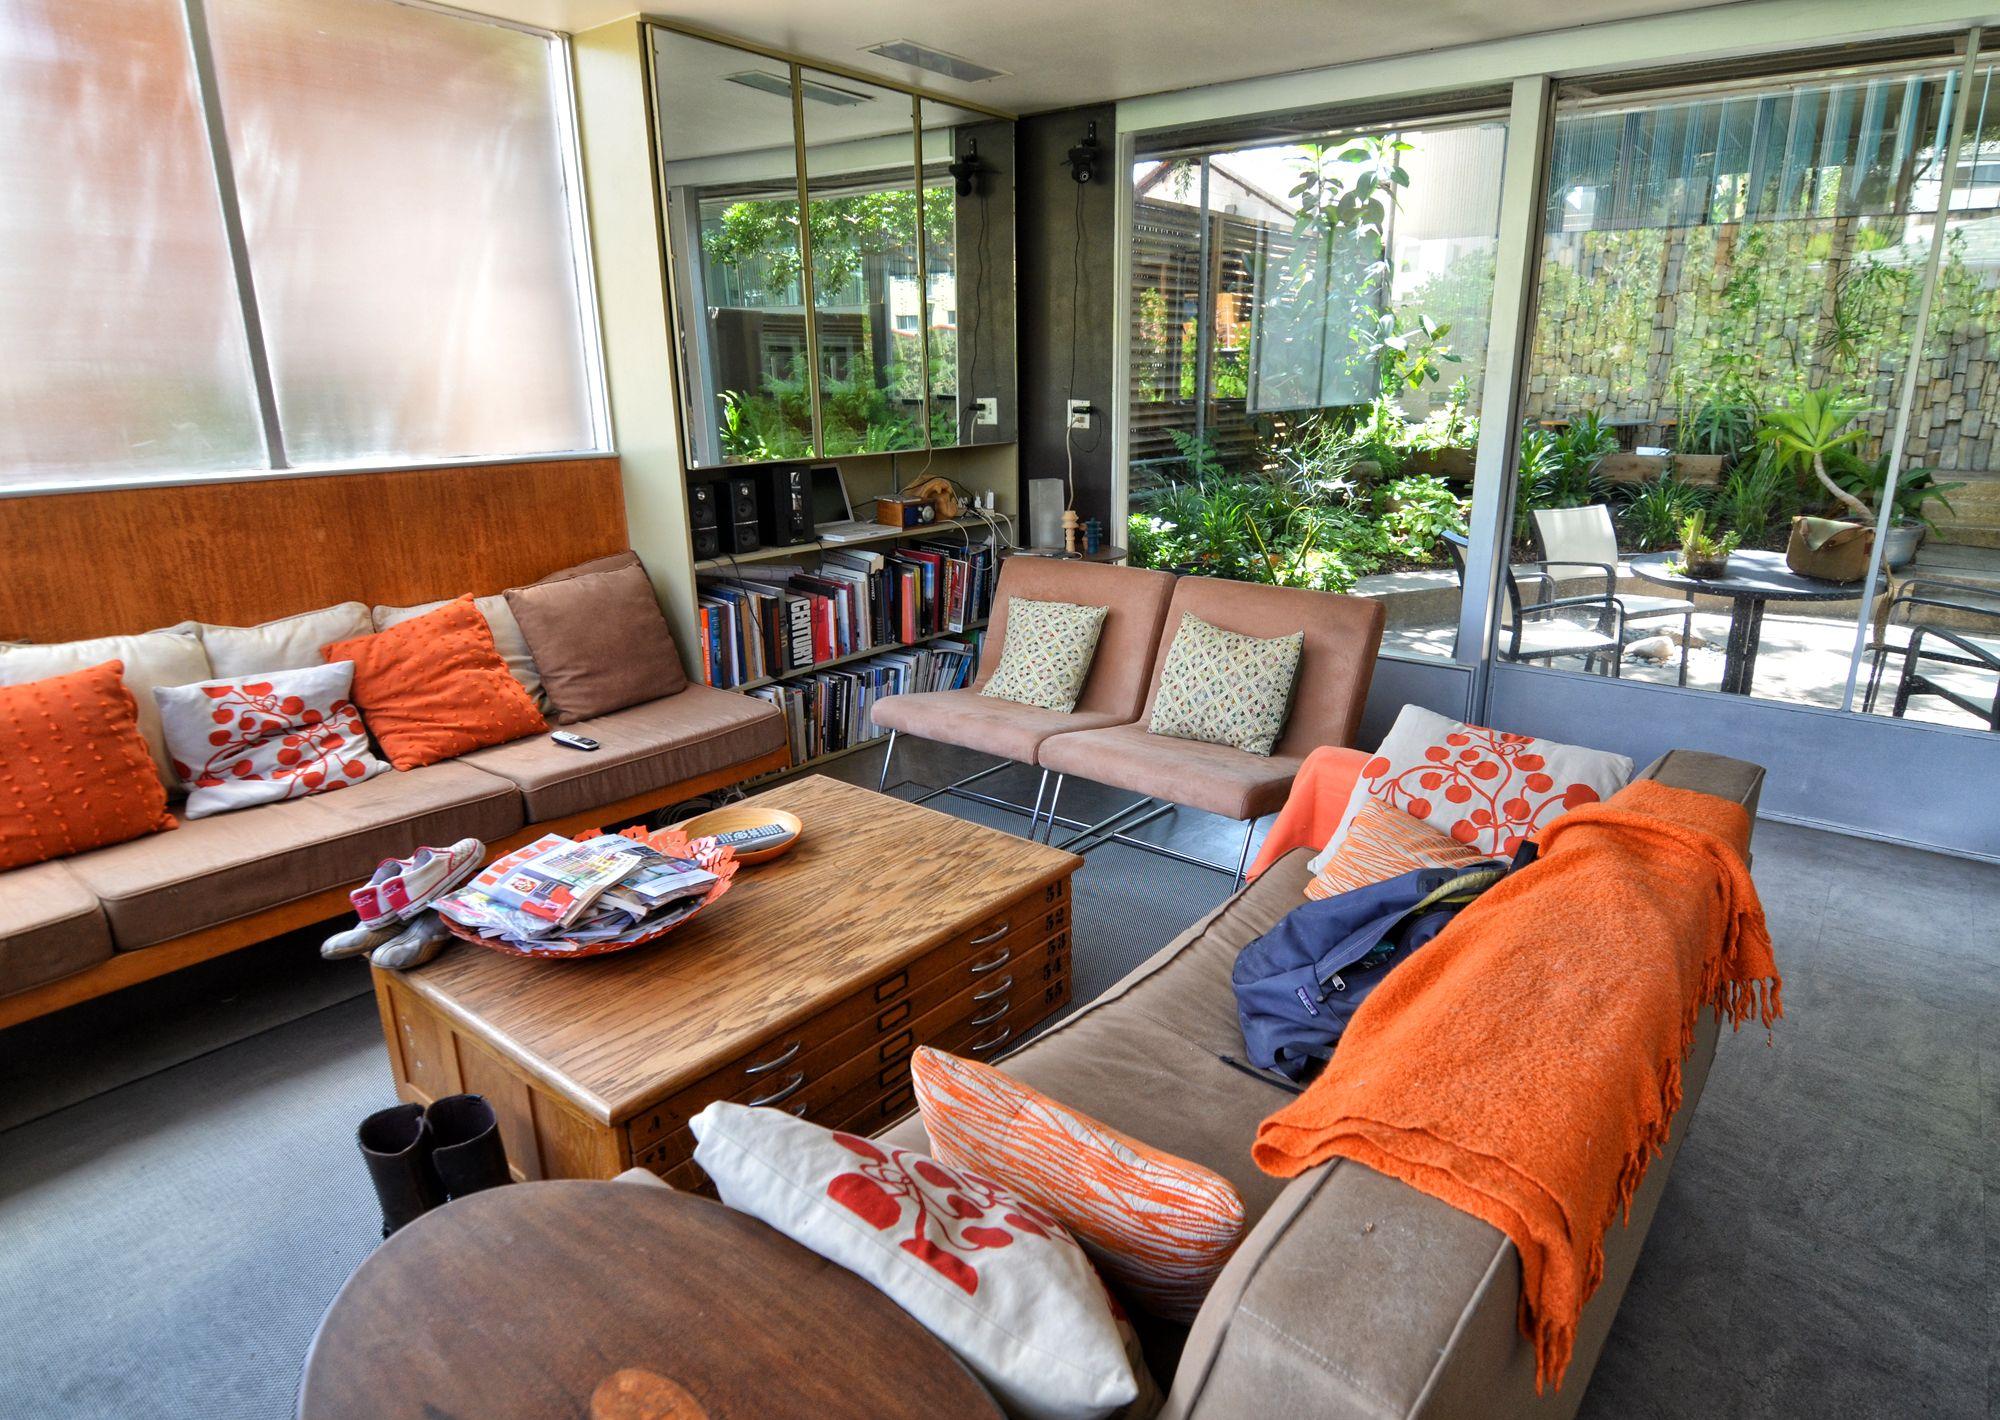 A look inside the neutra vdl house living room ideas apartment